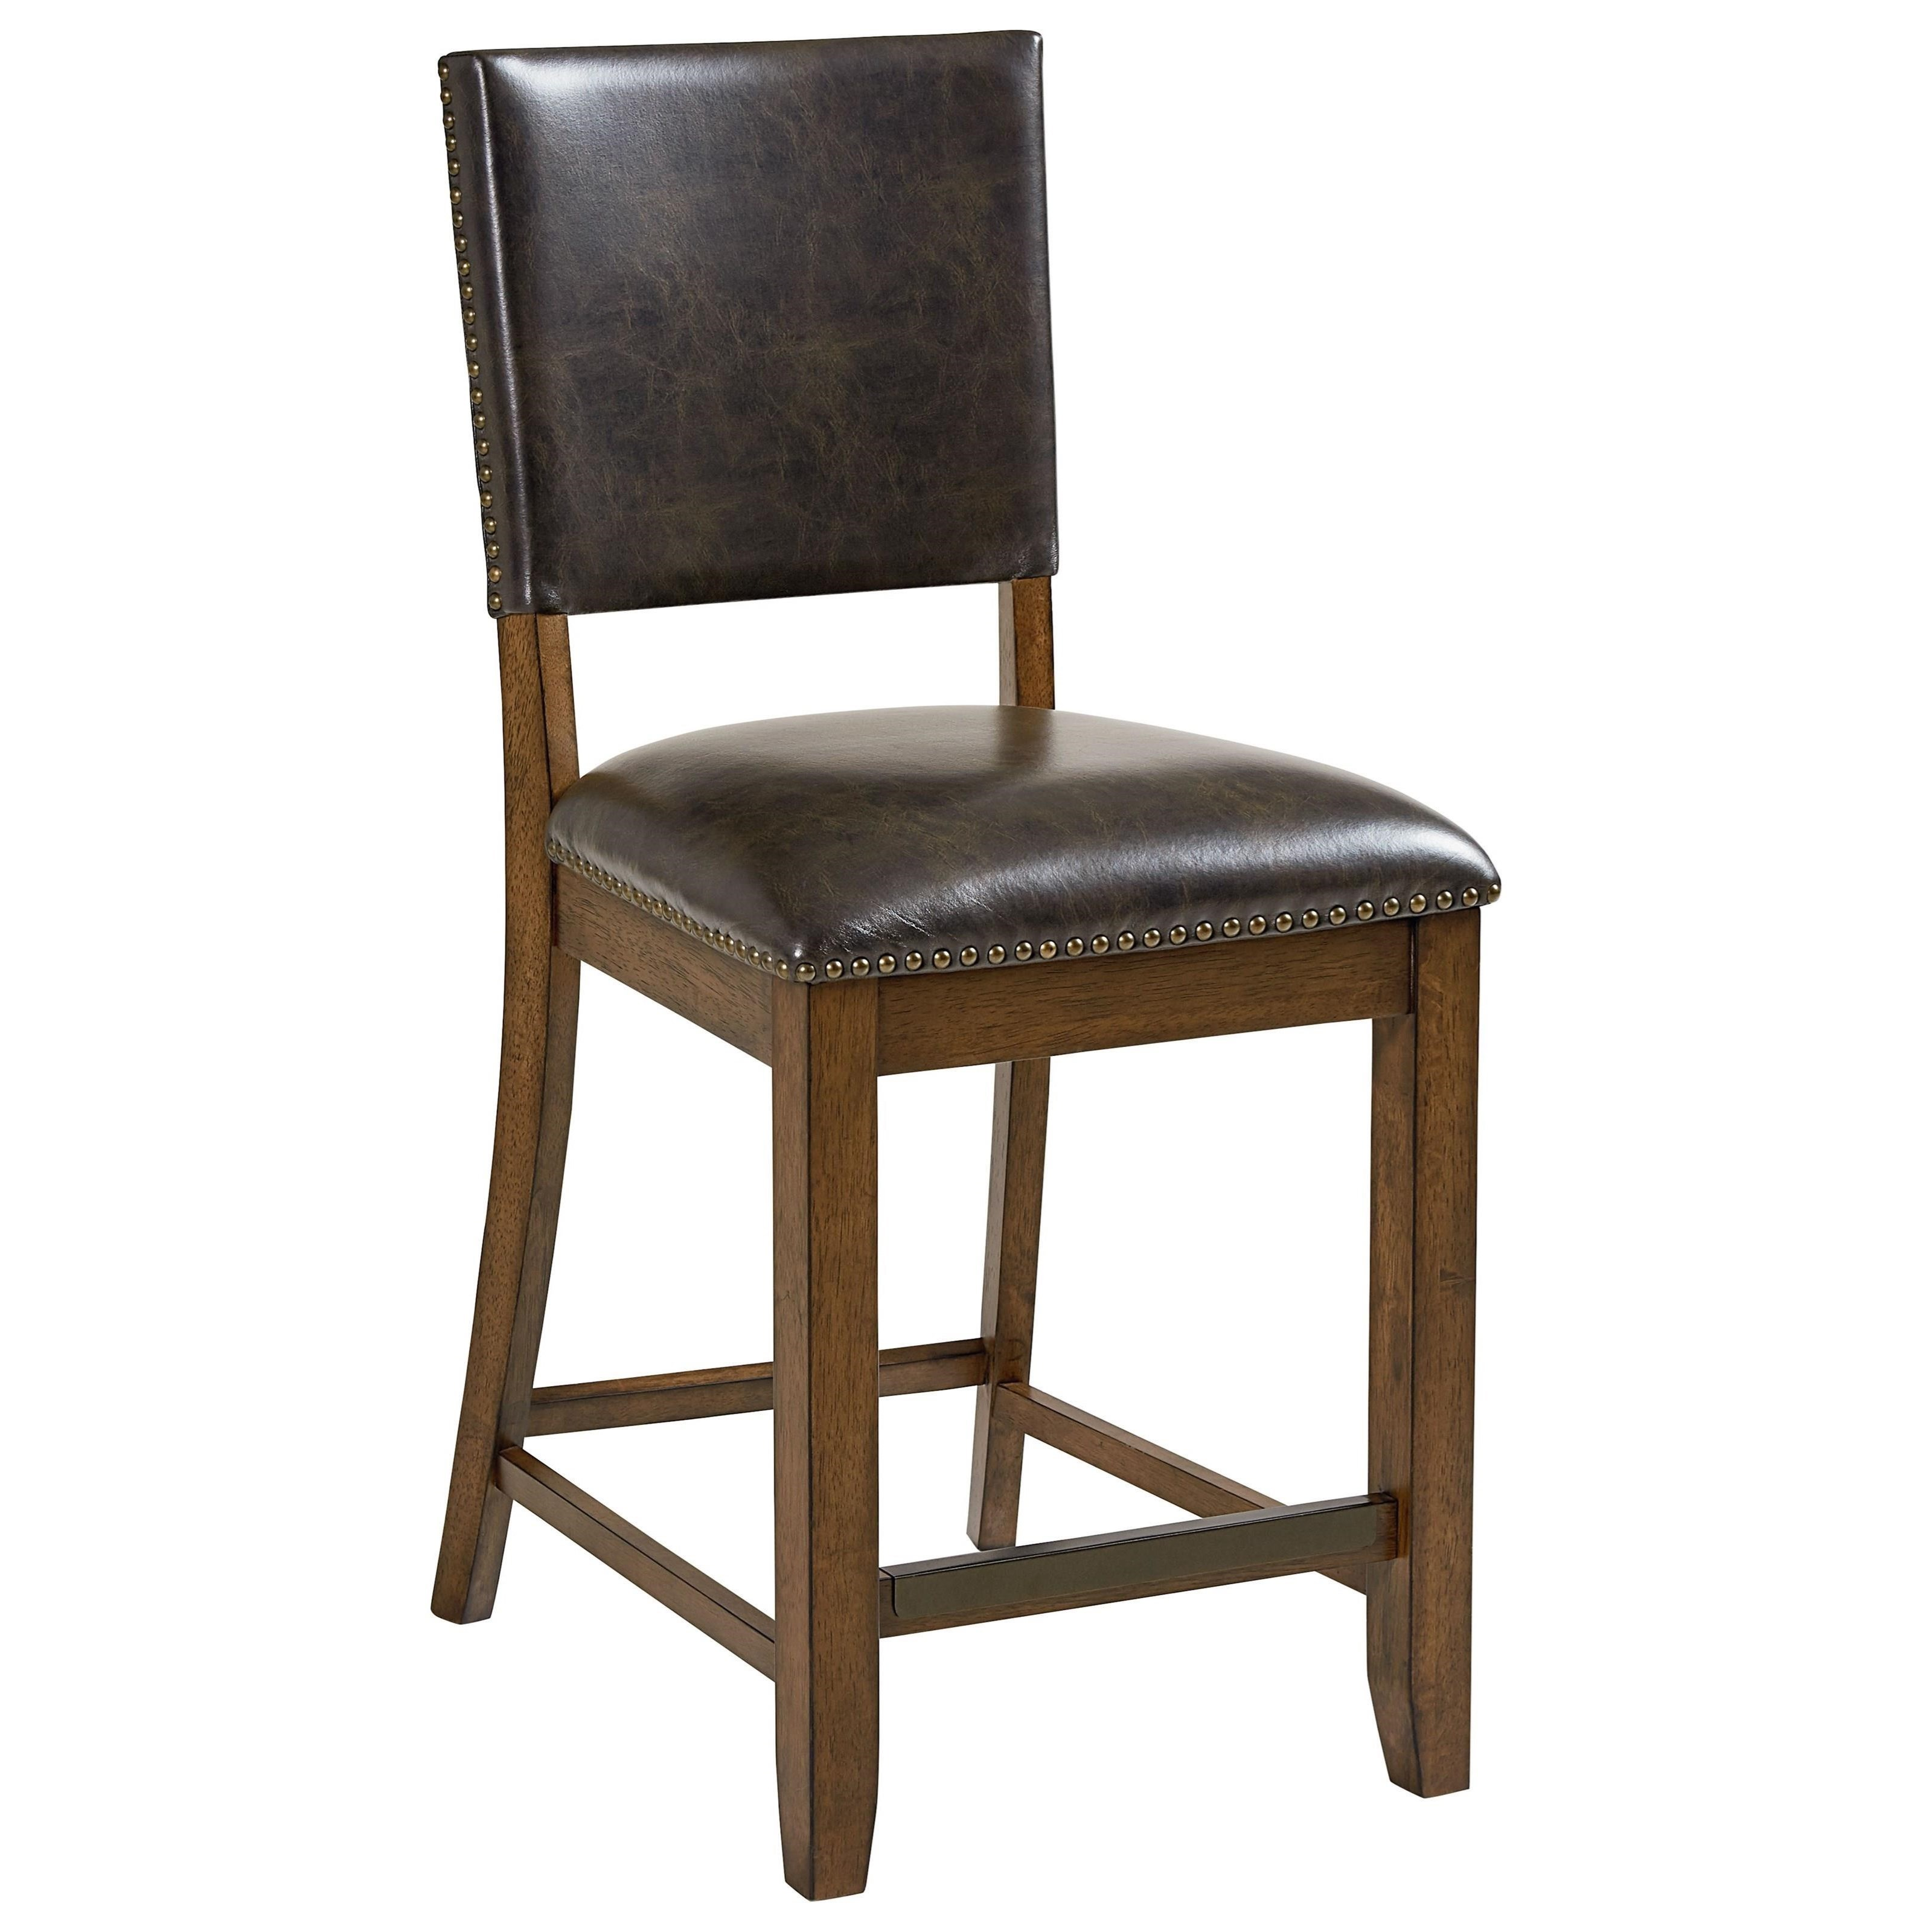 Standard Furniture Benson Upholstered Counter Stool - Item Number: 11537